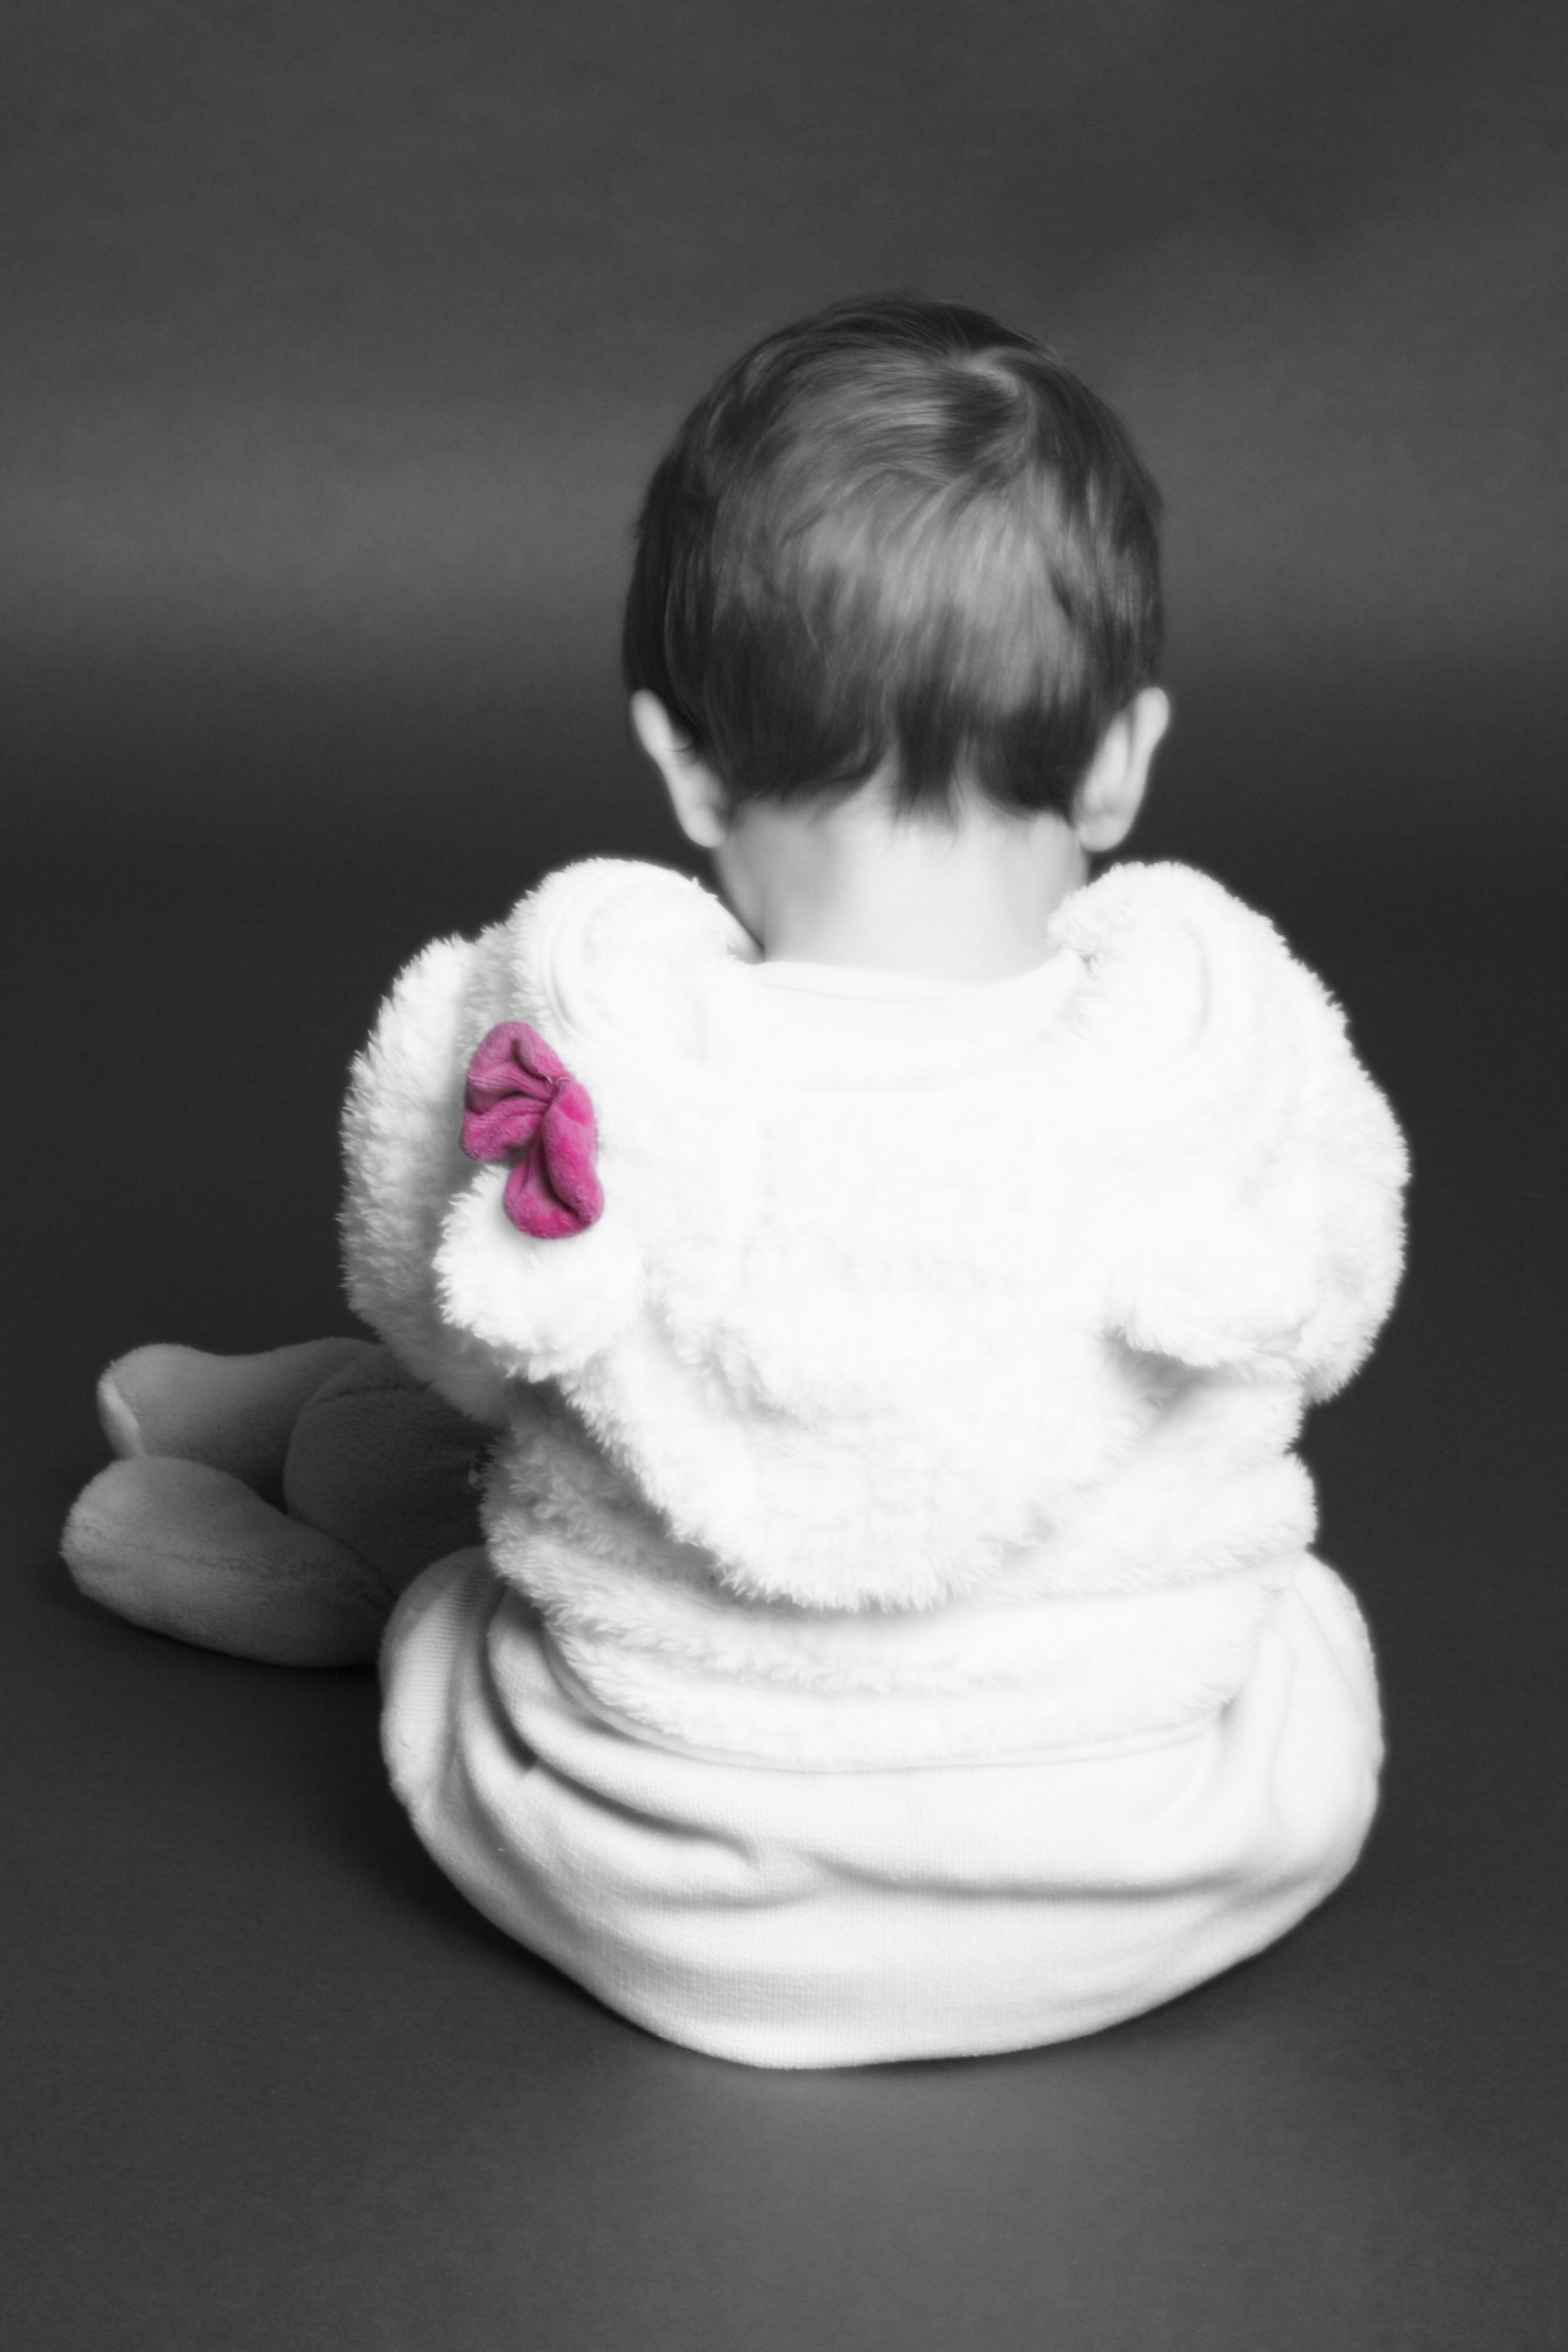 Babyfoto by Fabiola Pühringer